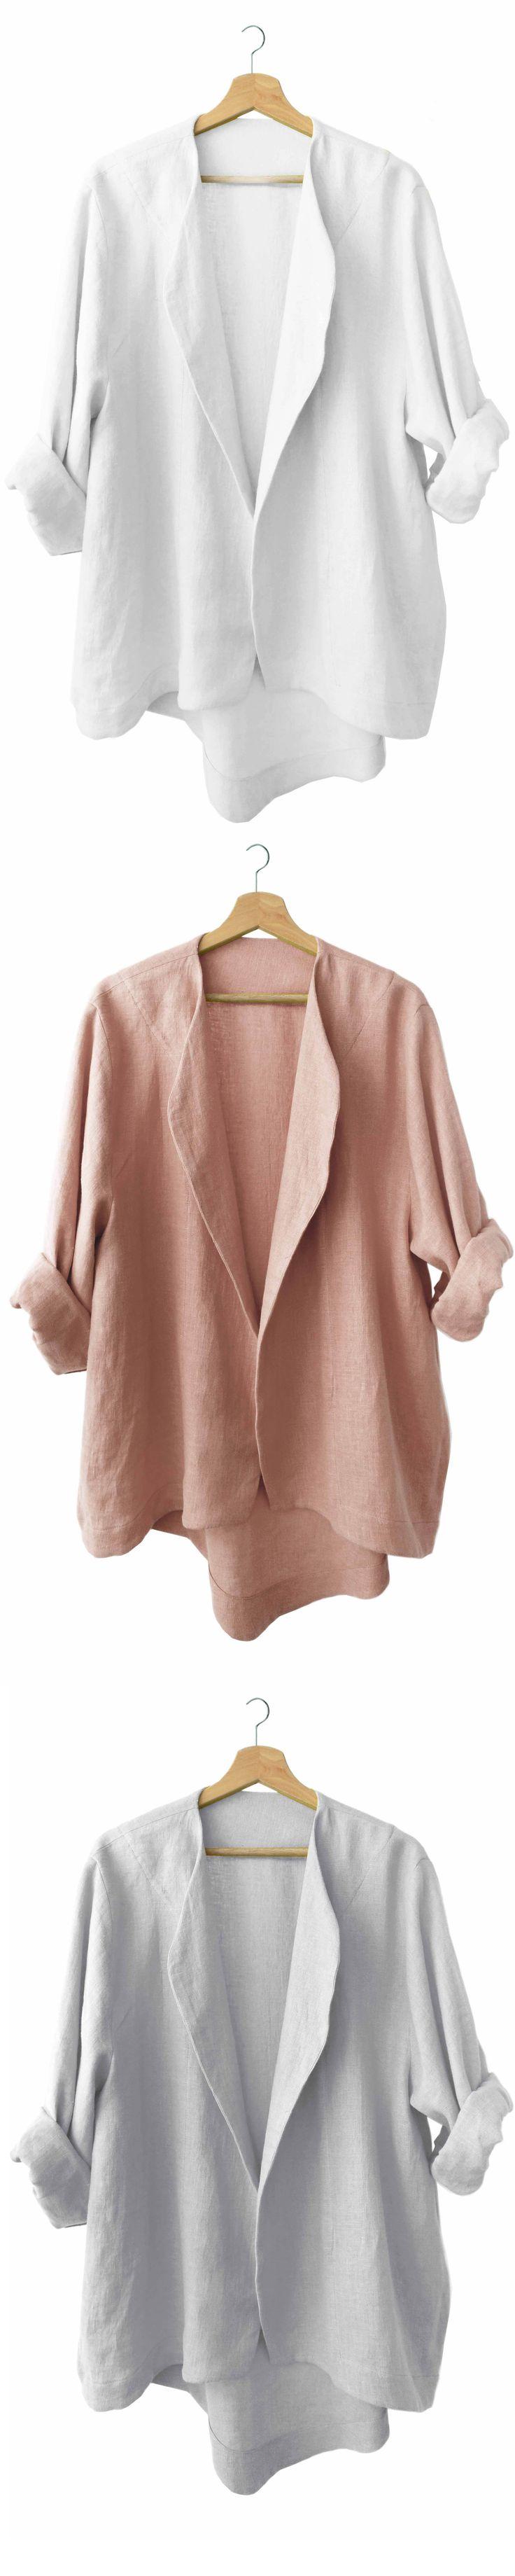 LOVELY HOME IDEA // LHI wear //  Linen jackets